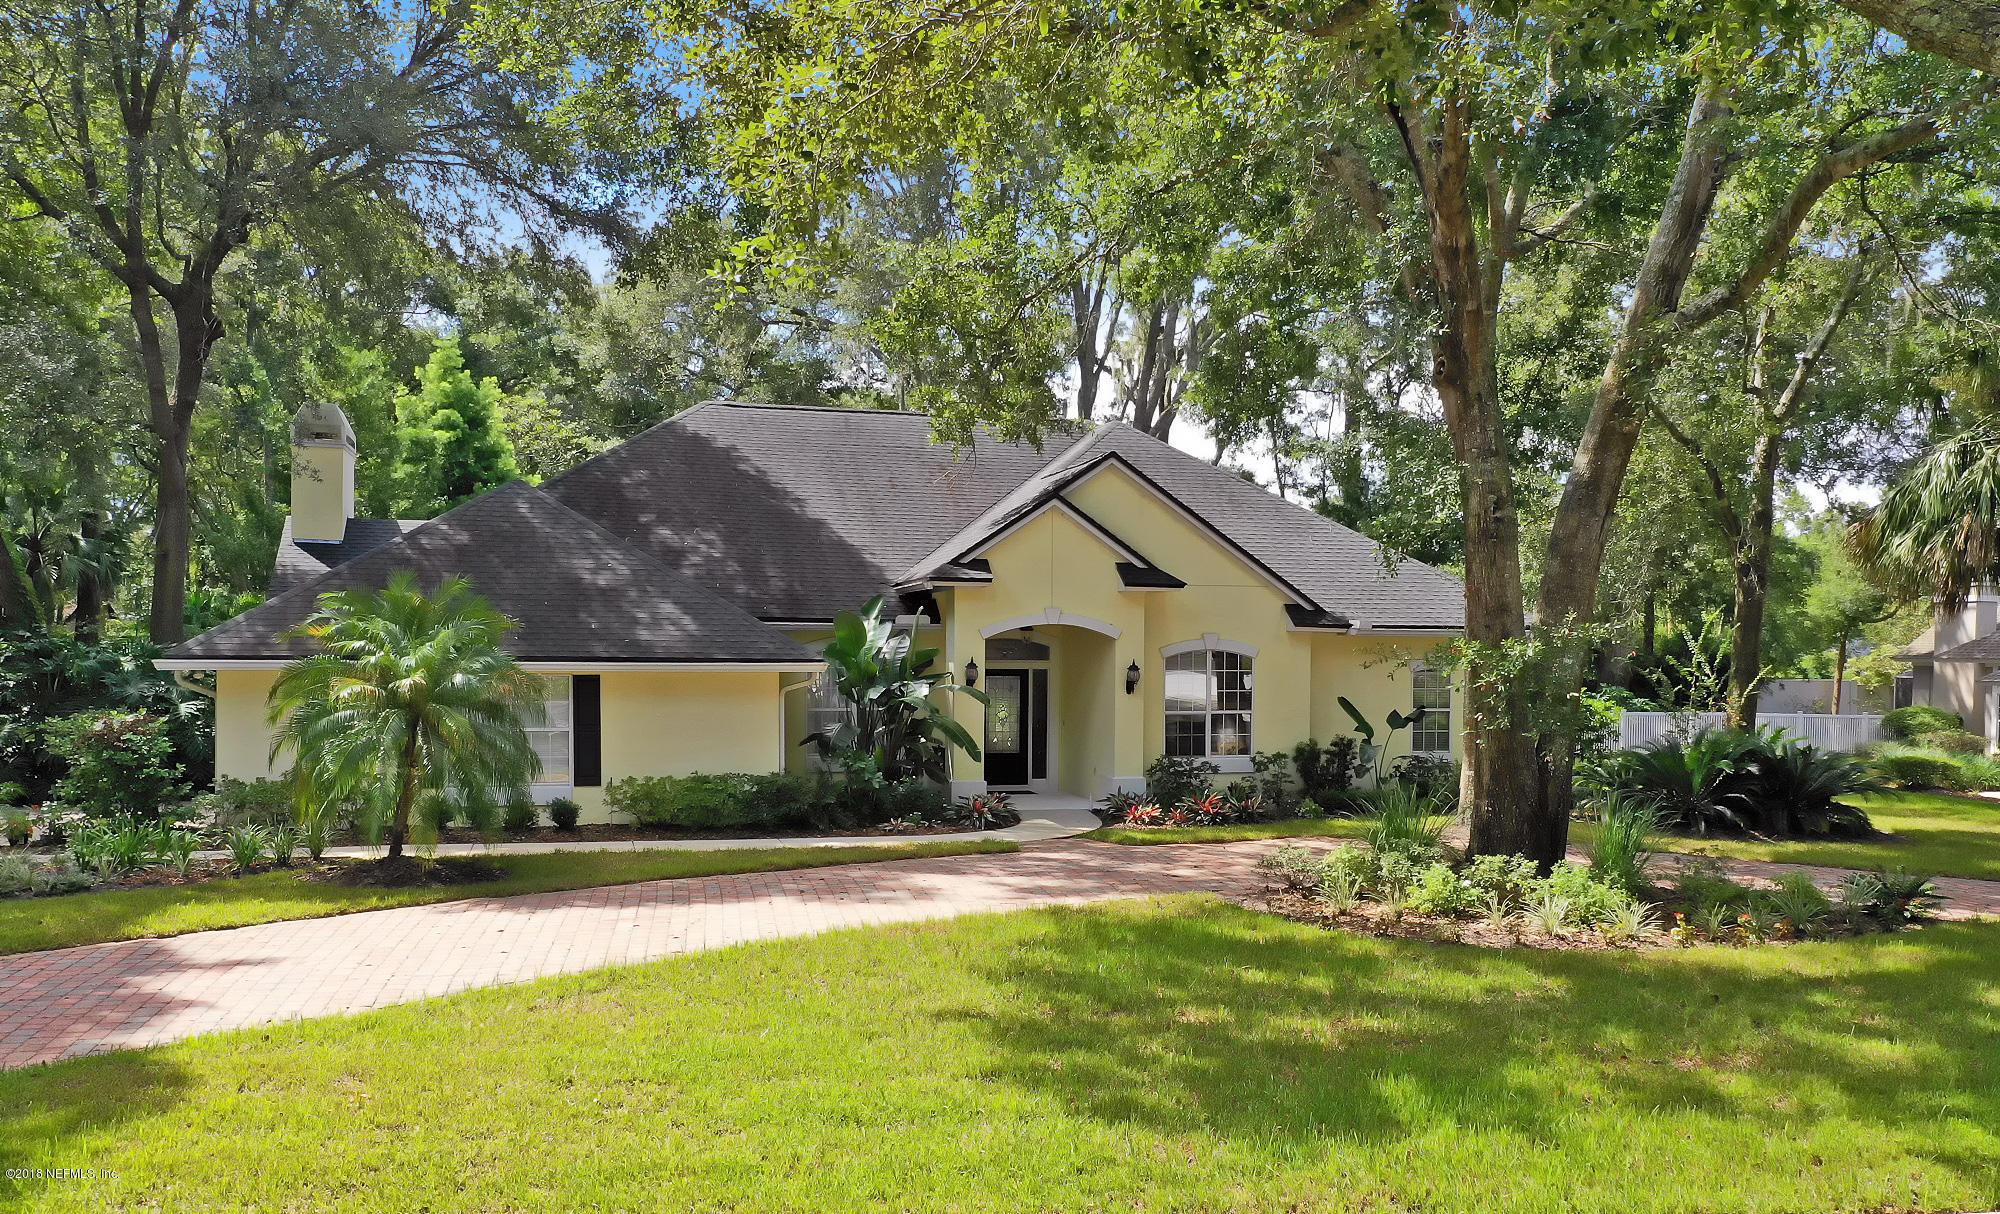 639 QUEENS HARBOR, JACKSONVILLE, FLORIDA 32225, 4 Bedrooms Bedrooms, ,3 BathroomsBathrooms,Residential - single family,For sale,QUEENS HARBOR,956896